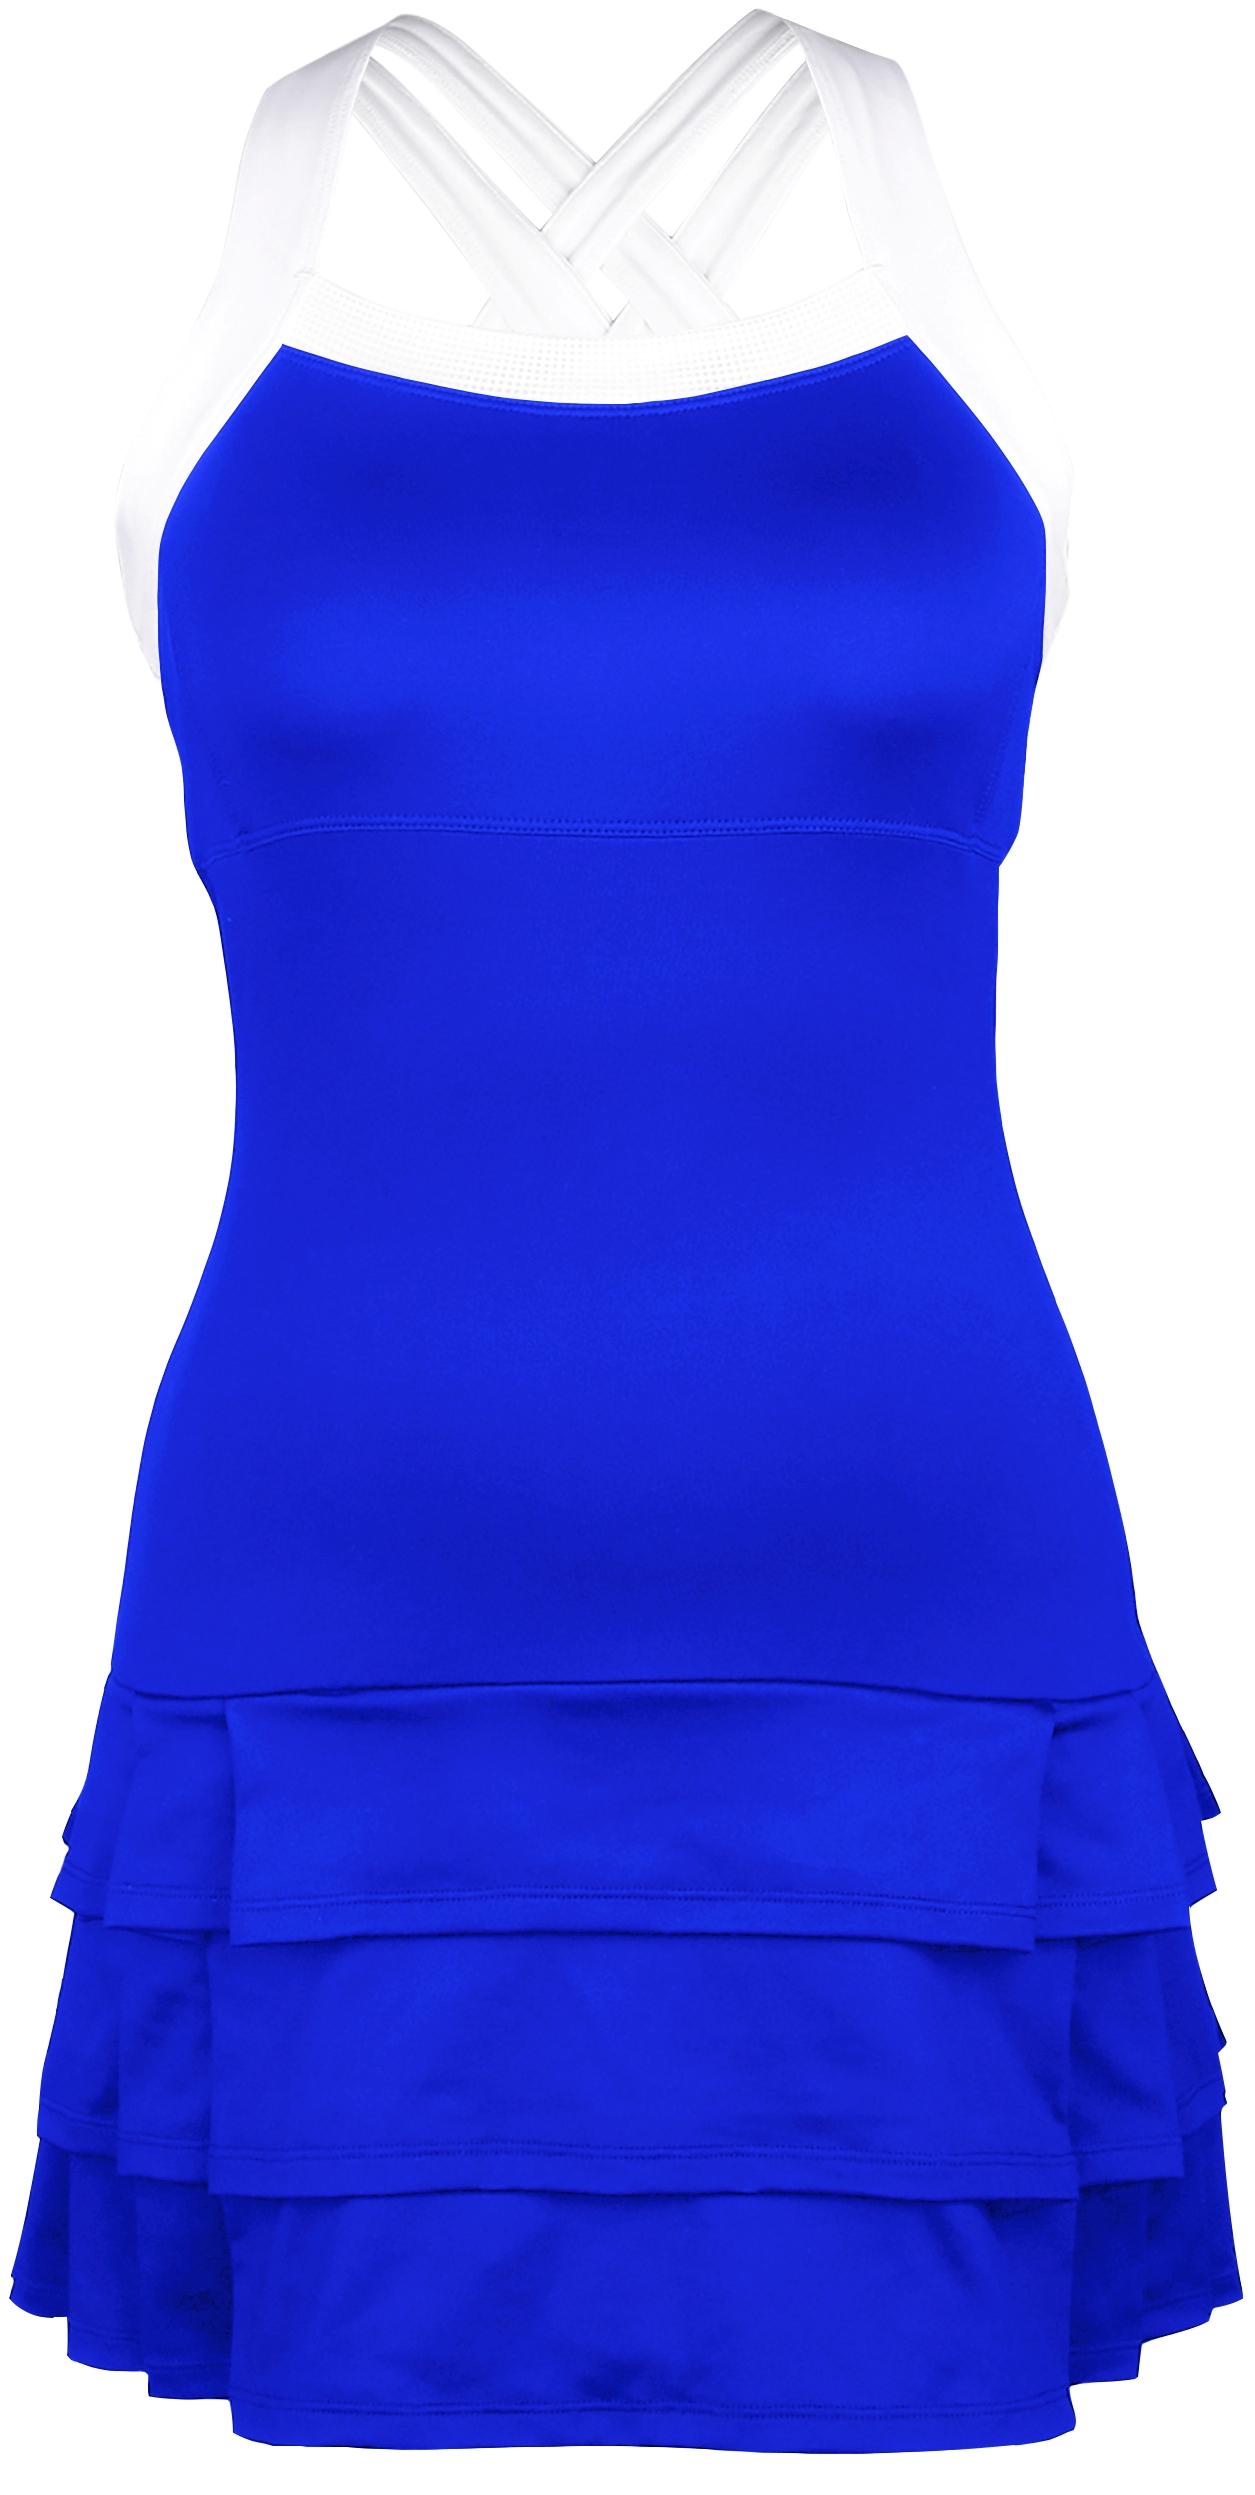 DUC Grace Women's Tennis Dress (Royal Blue/White)